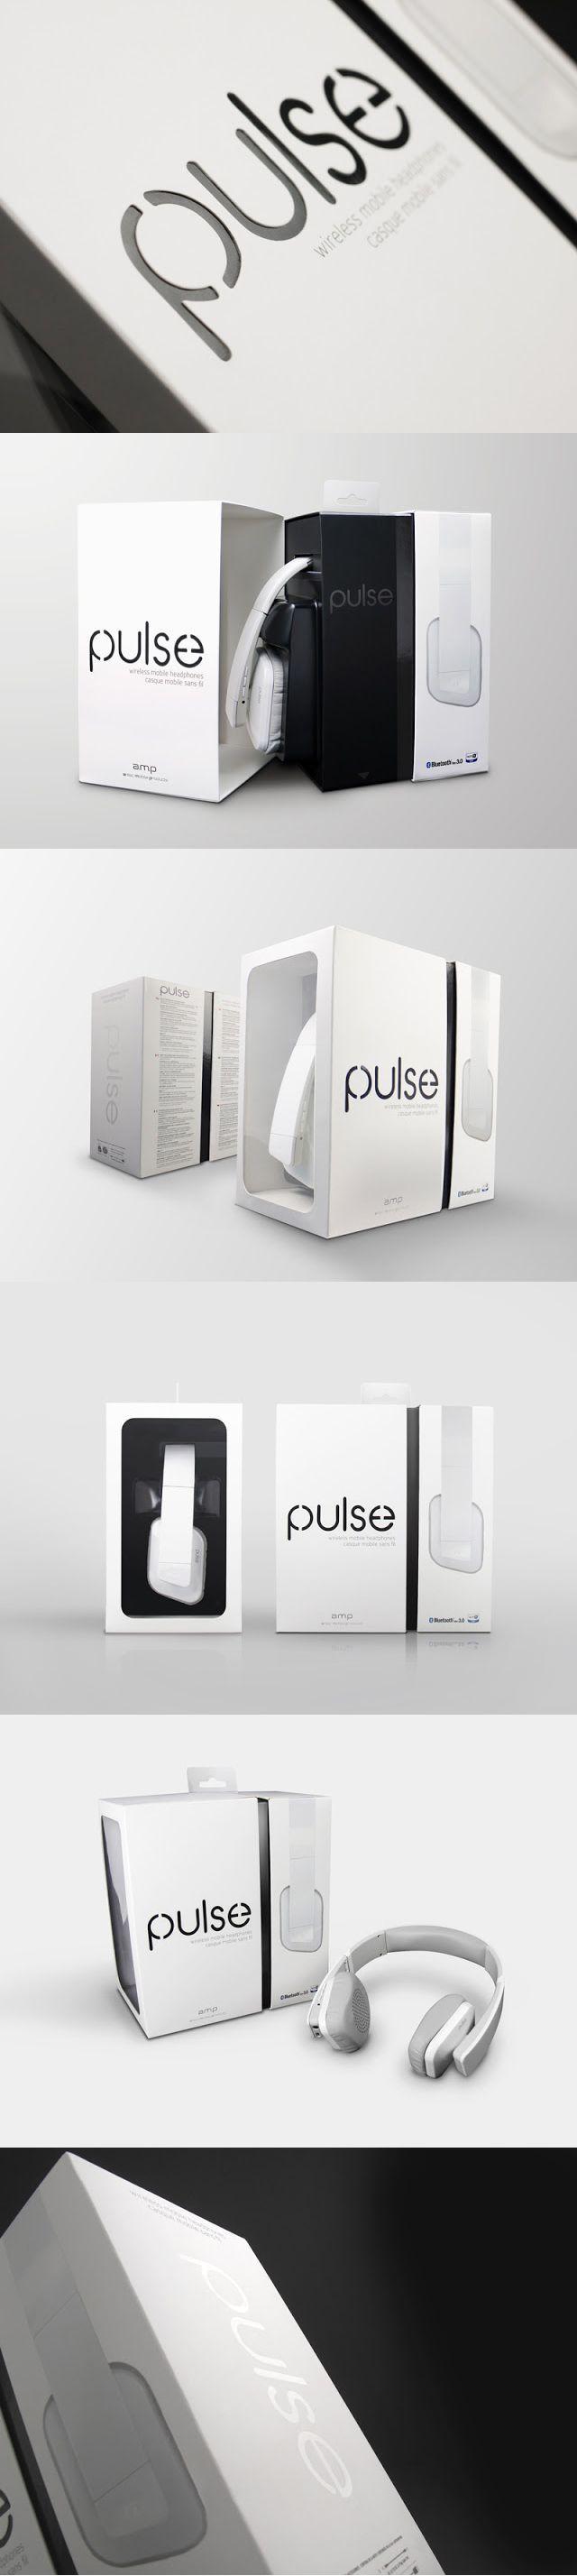 Designed by CRE8 DESIGN l Taiwan